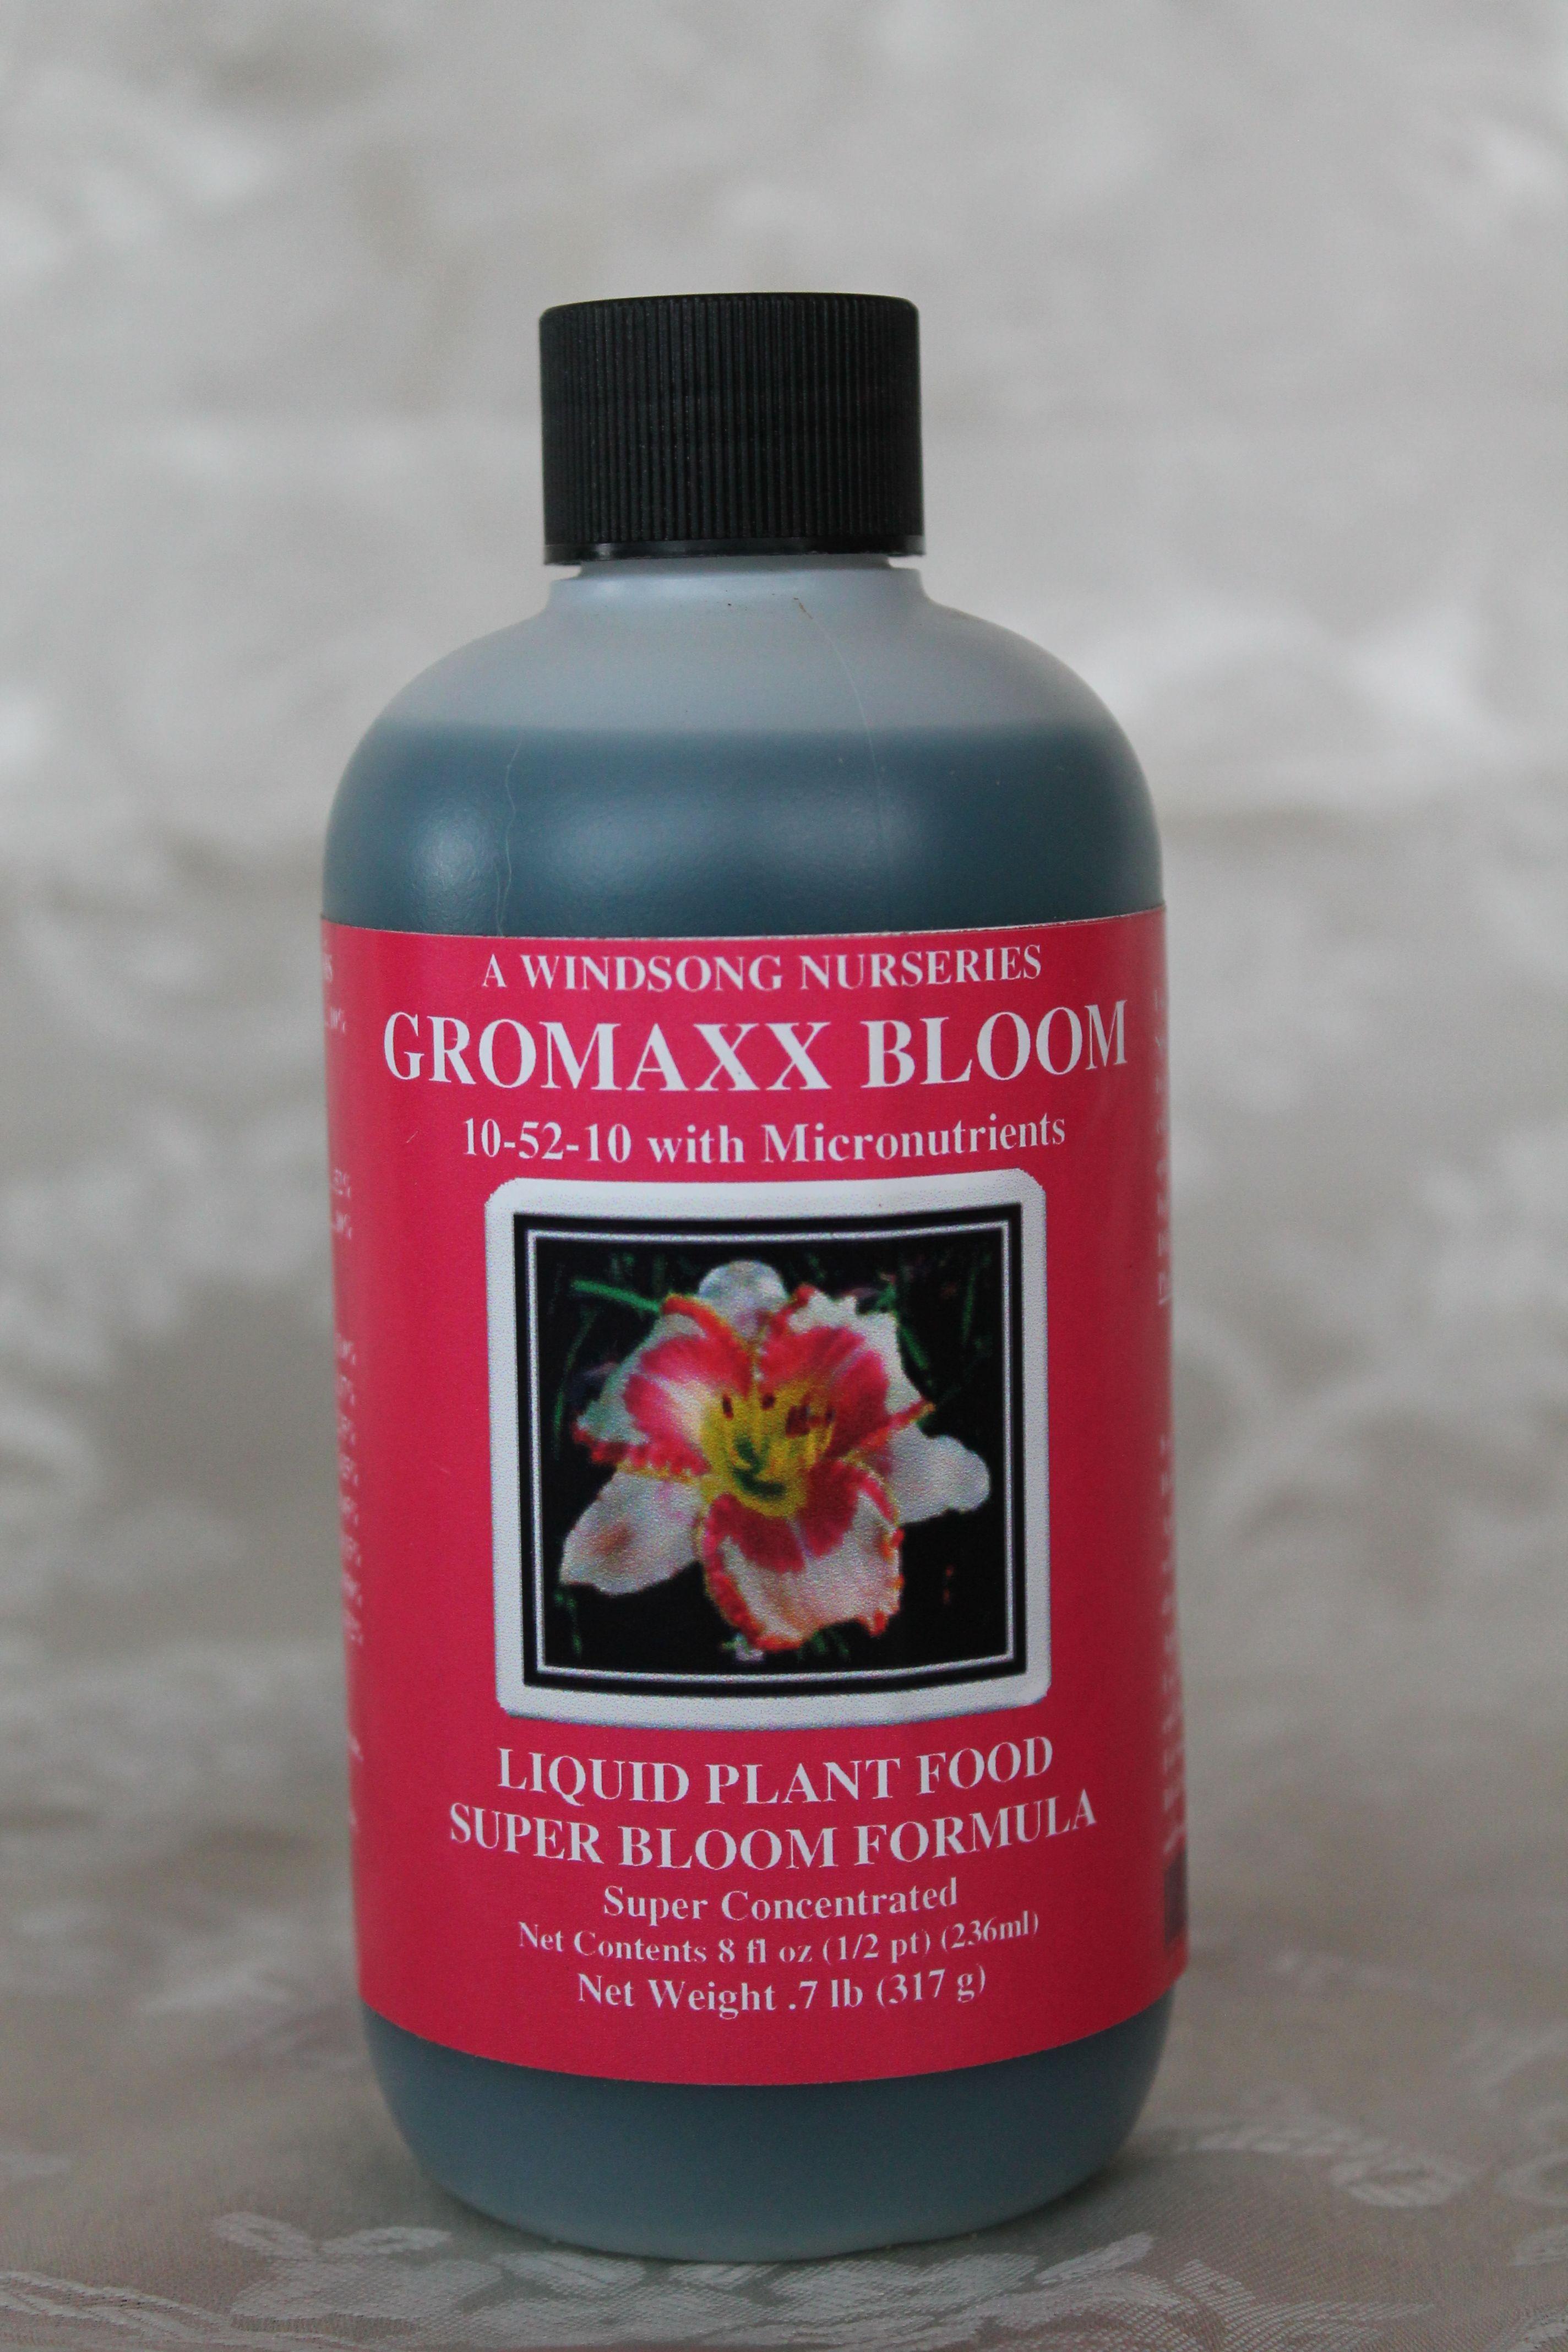 LIQUID FERTILIZER GROMAXX BLOOM with Micronutrients 10-52-10 Special